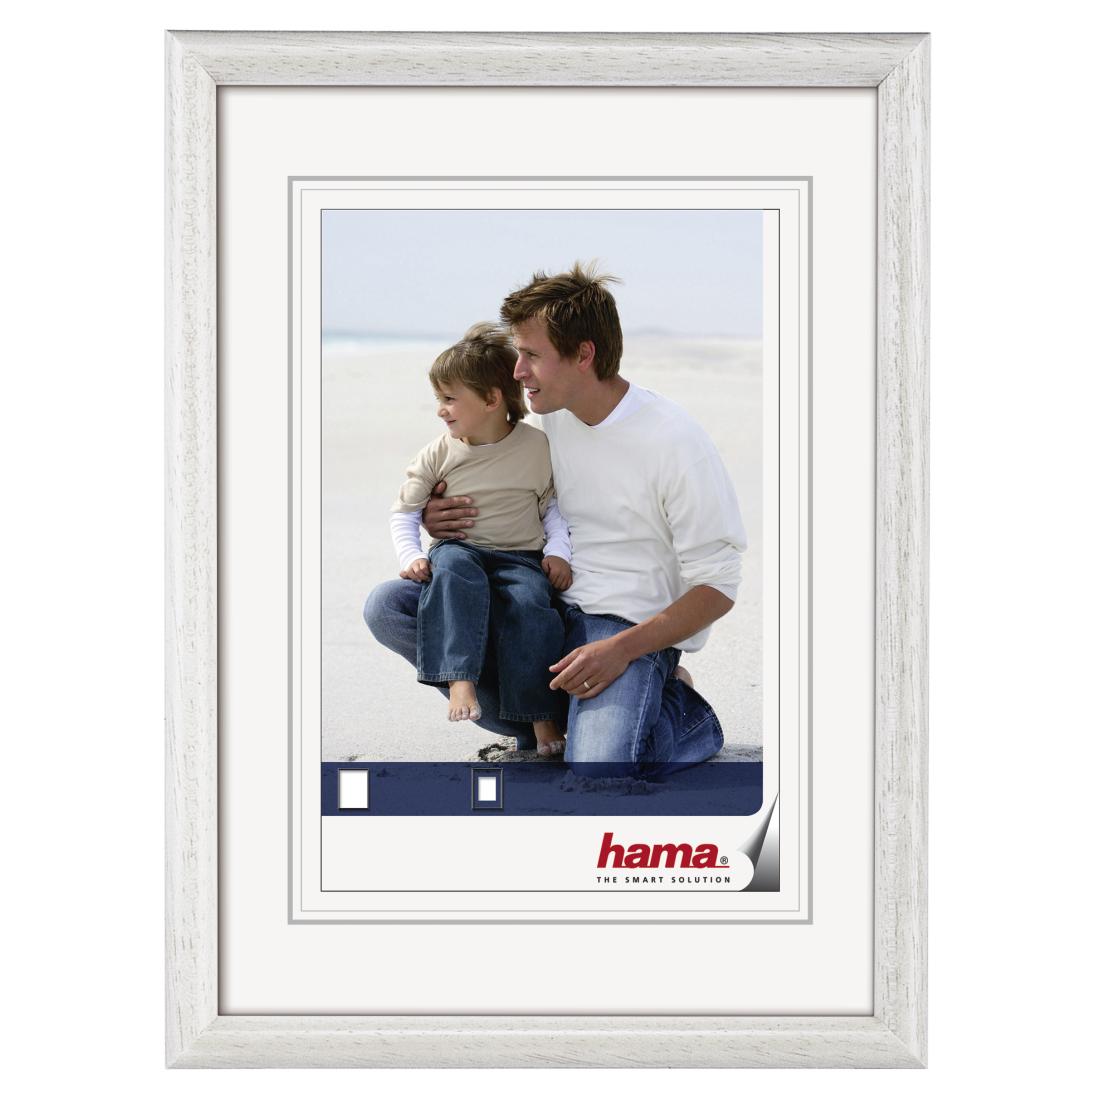 00064679 Hama Wooden Frame \